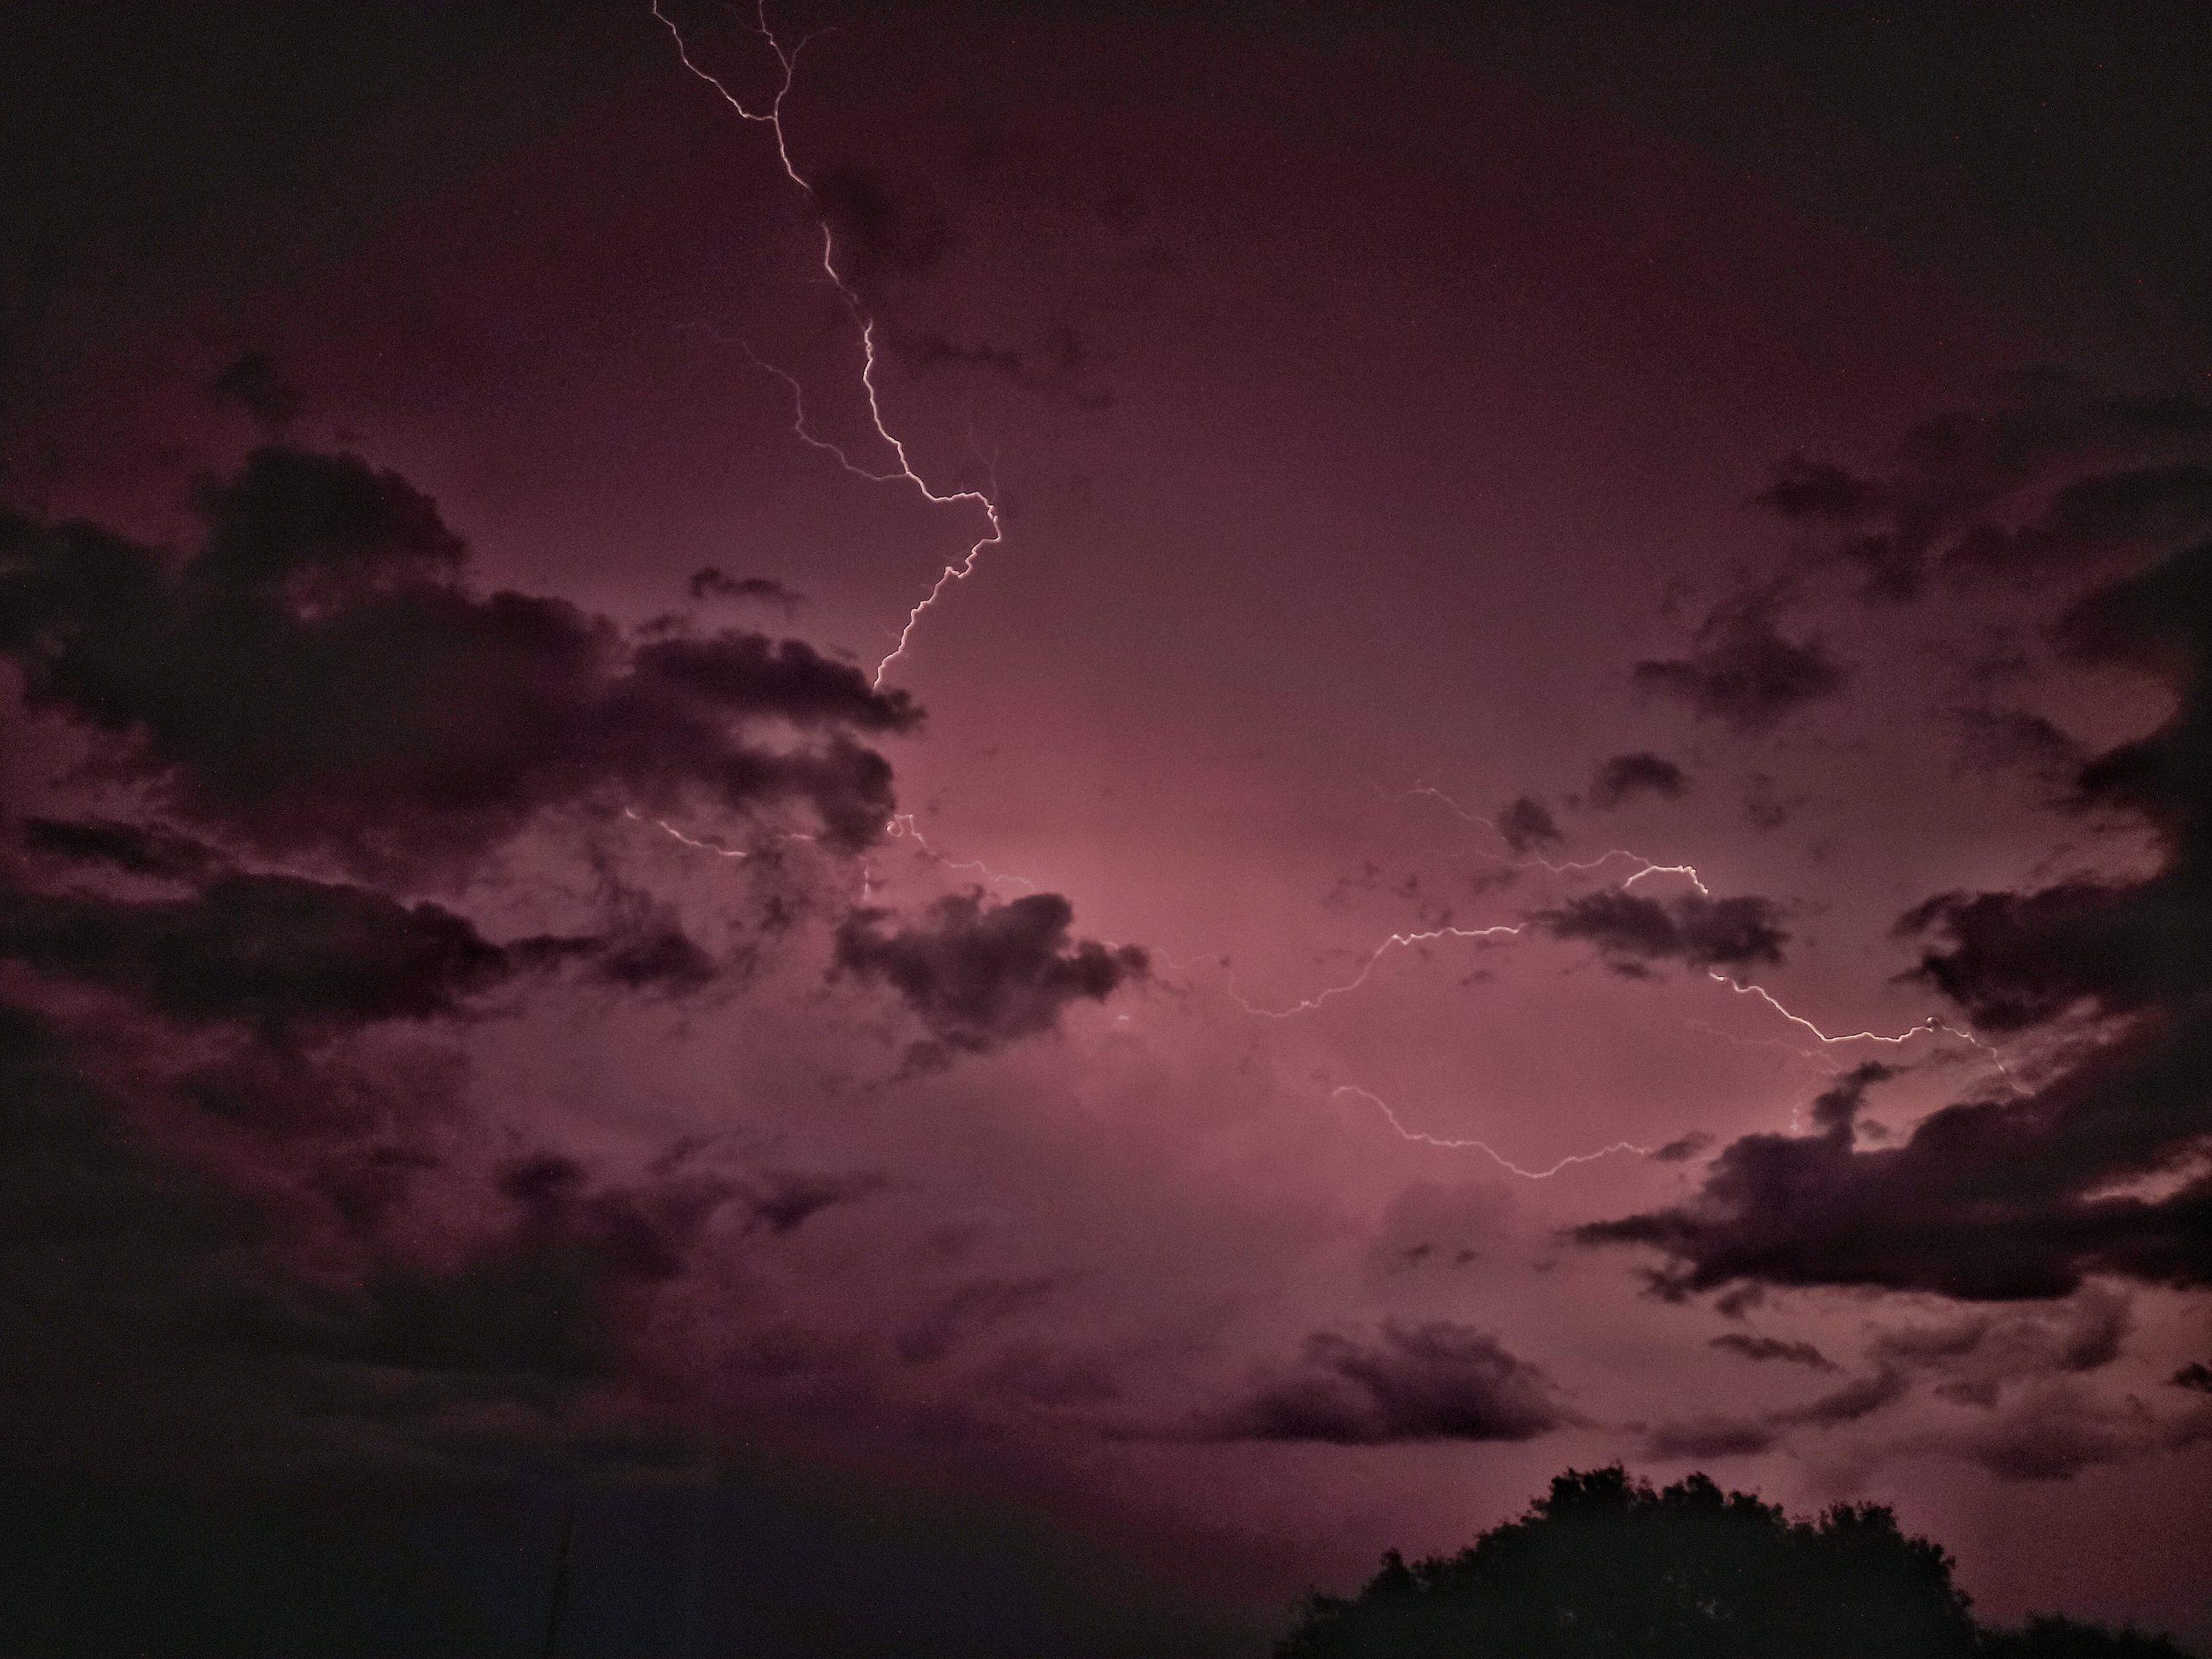 lightening flash in the sky